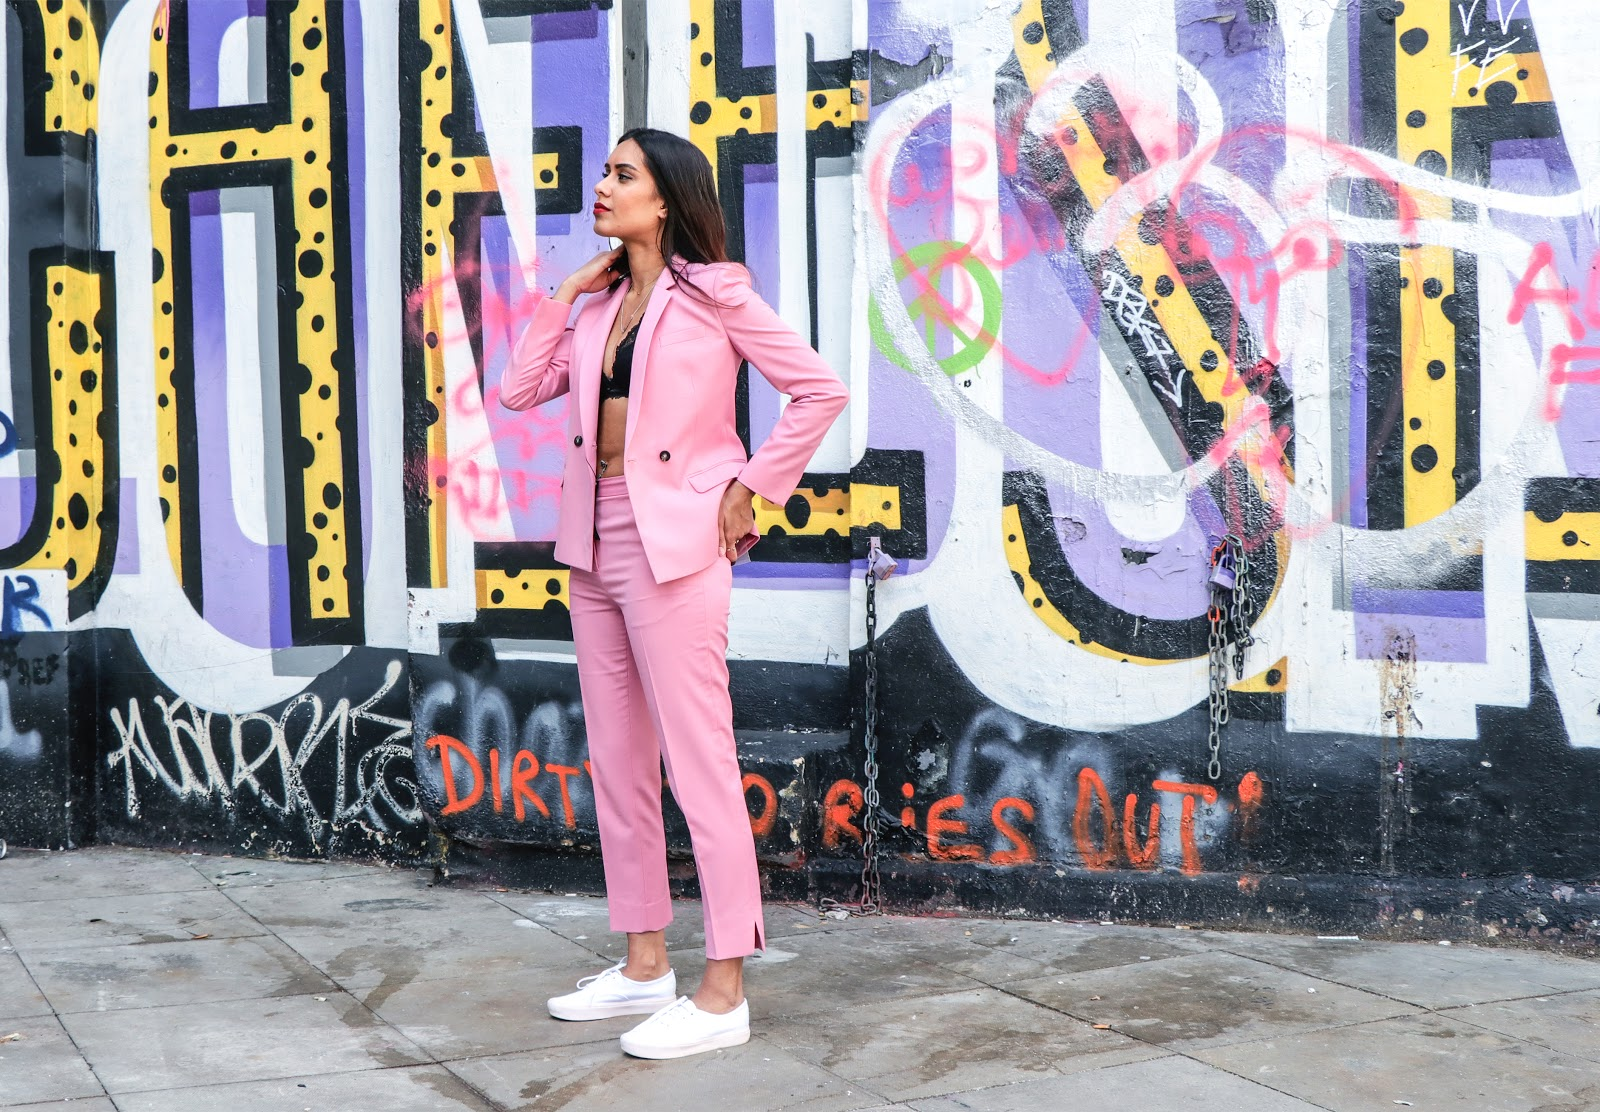 Pink Topshop suit worn by fashion blogger Reena Rai